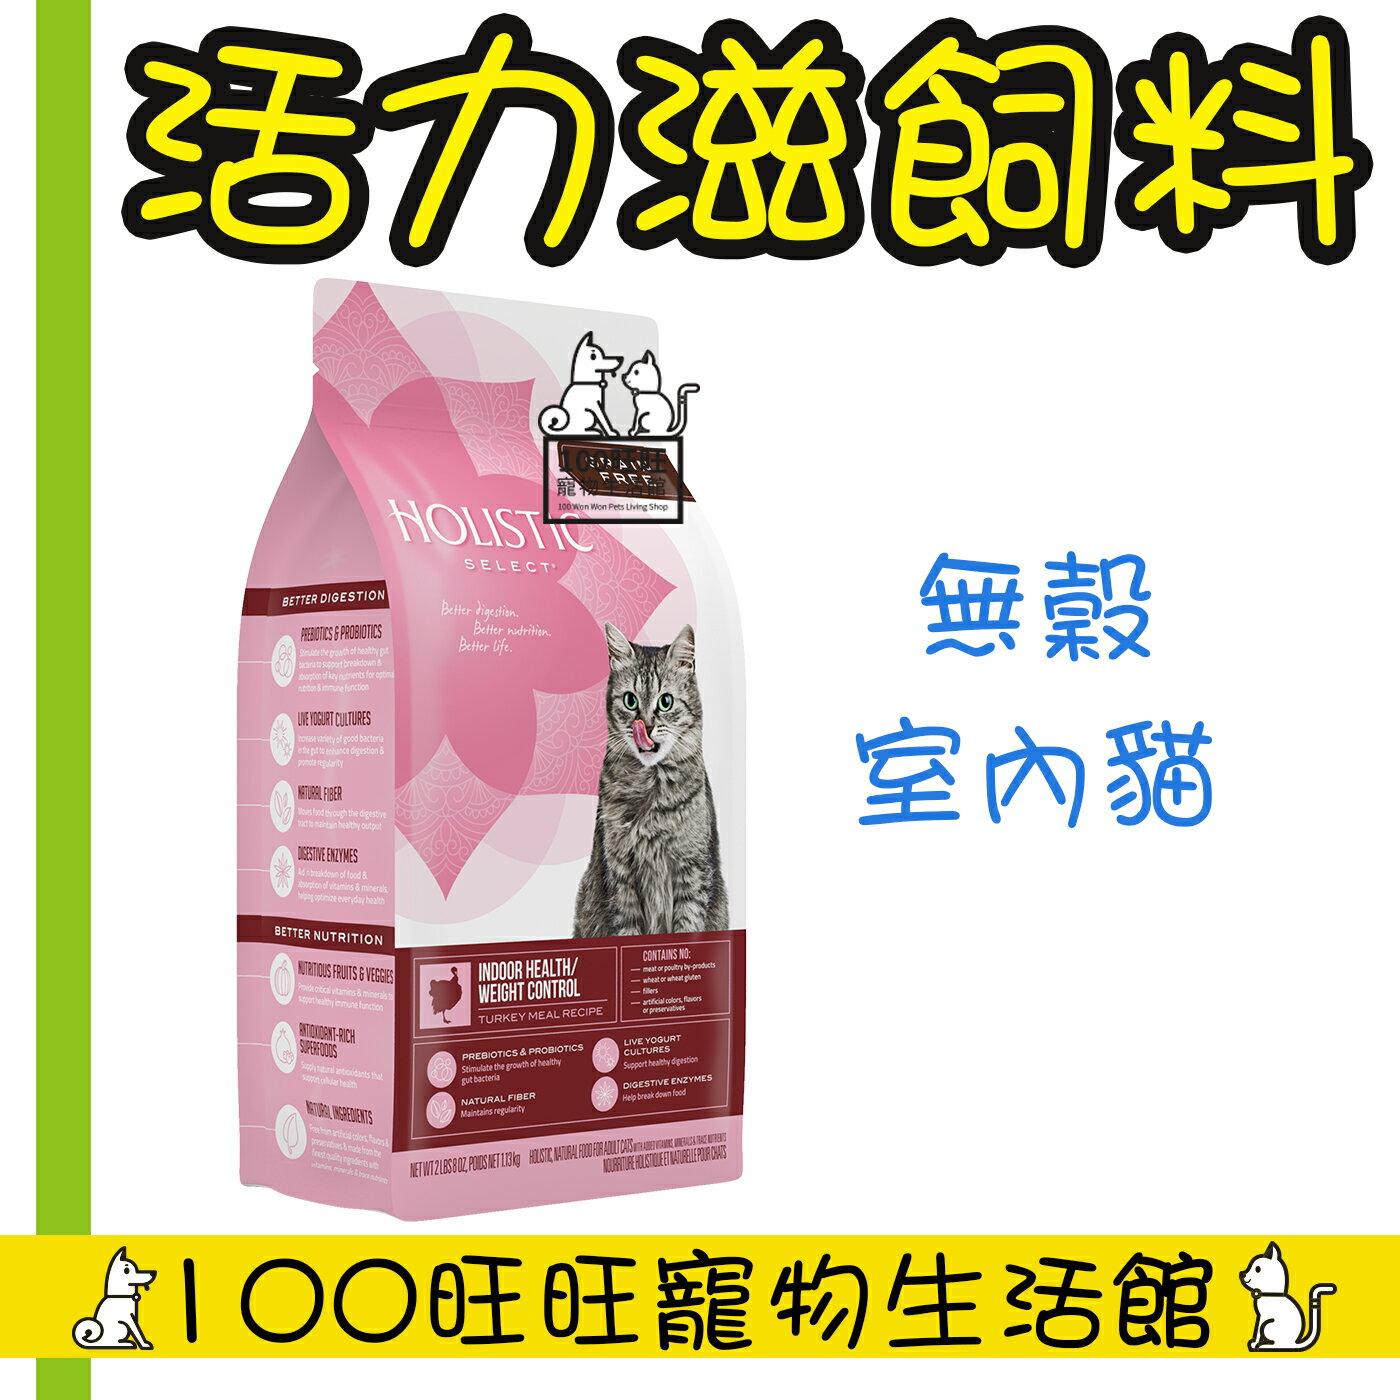 Holistic Select 活力滋 無穀室內貓-體重控制配方 2.5磅 1.13 kg